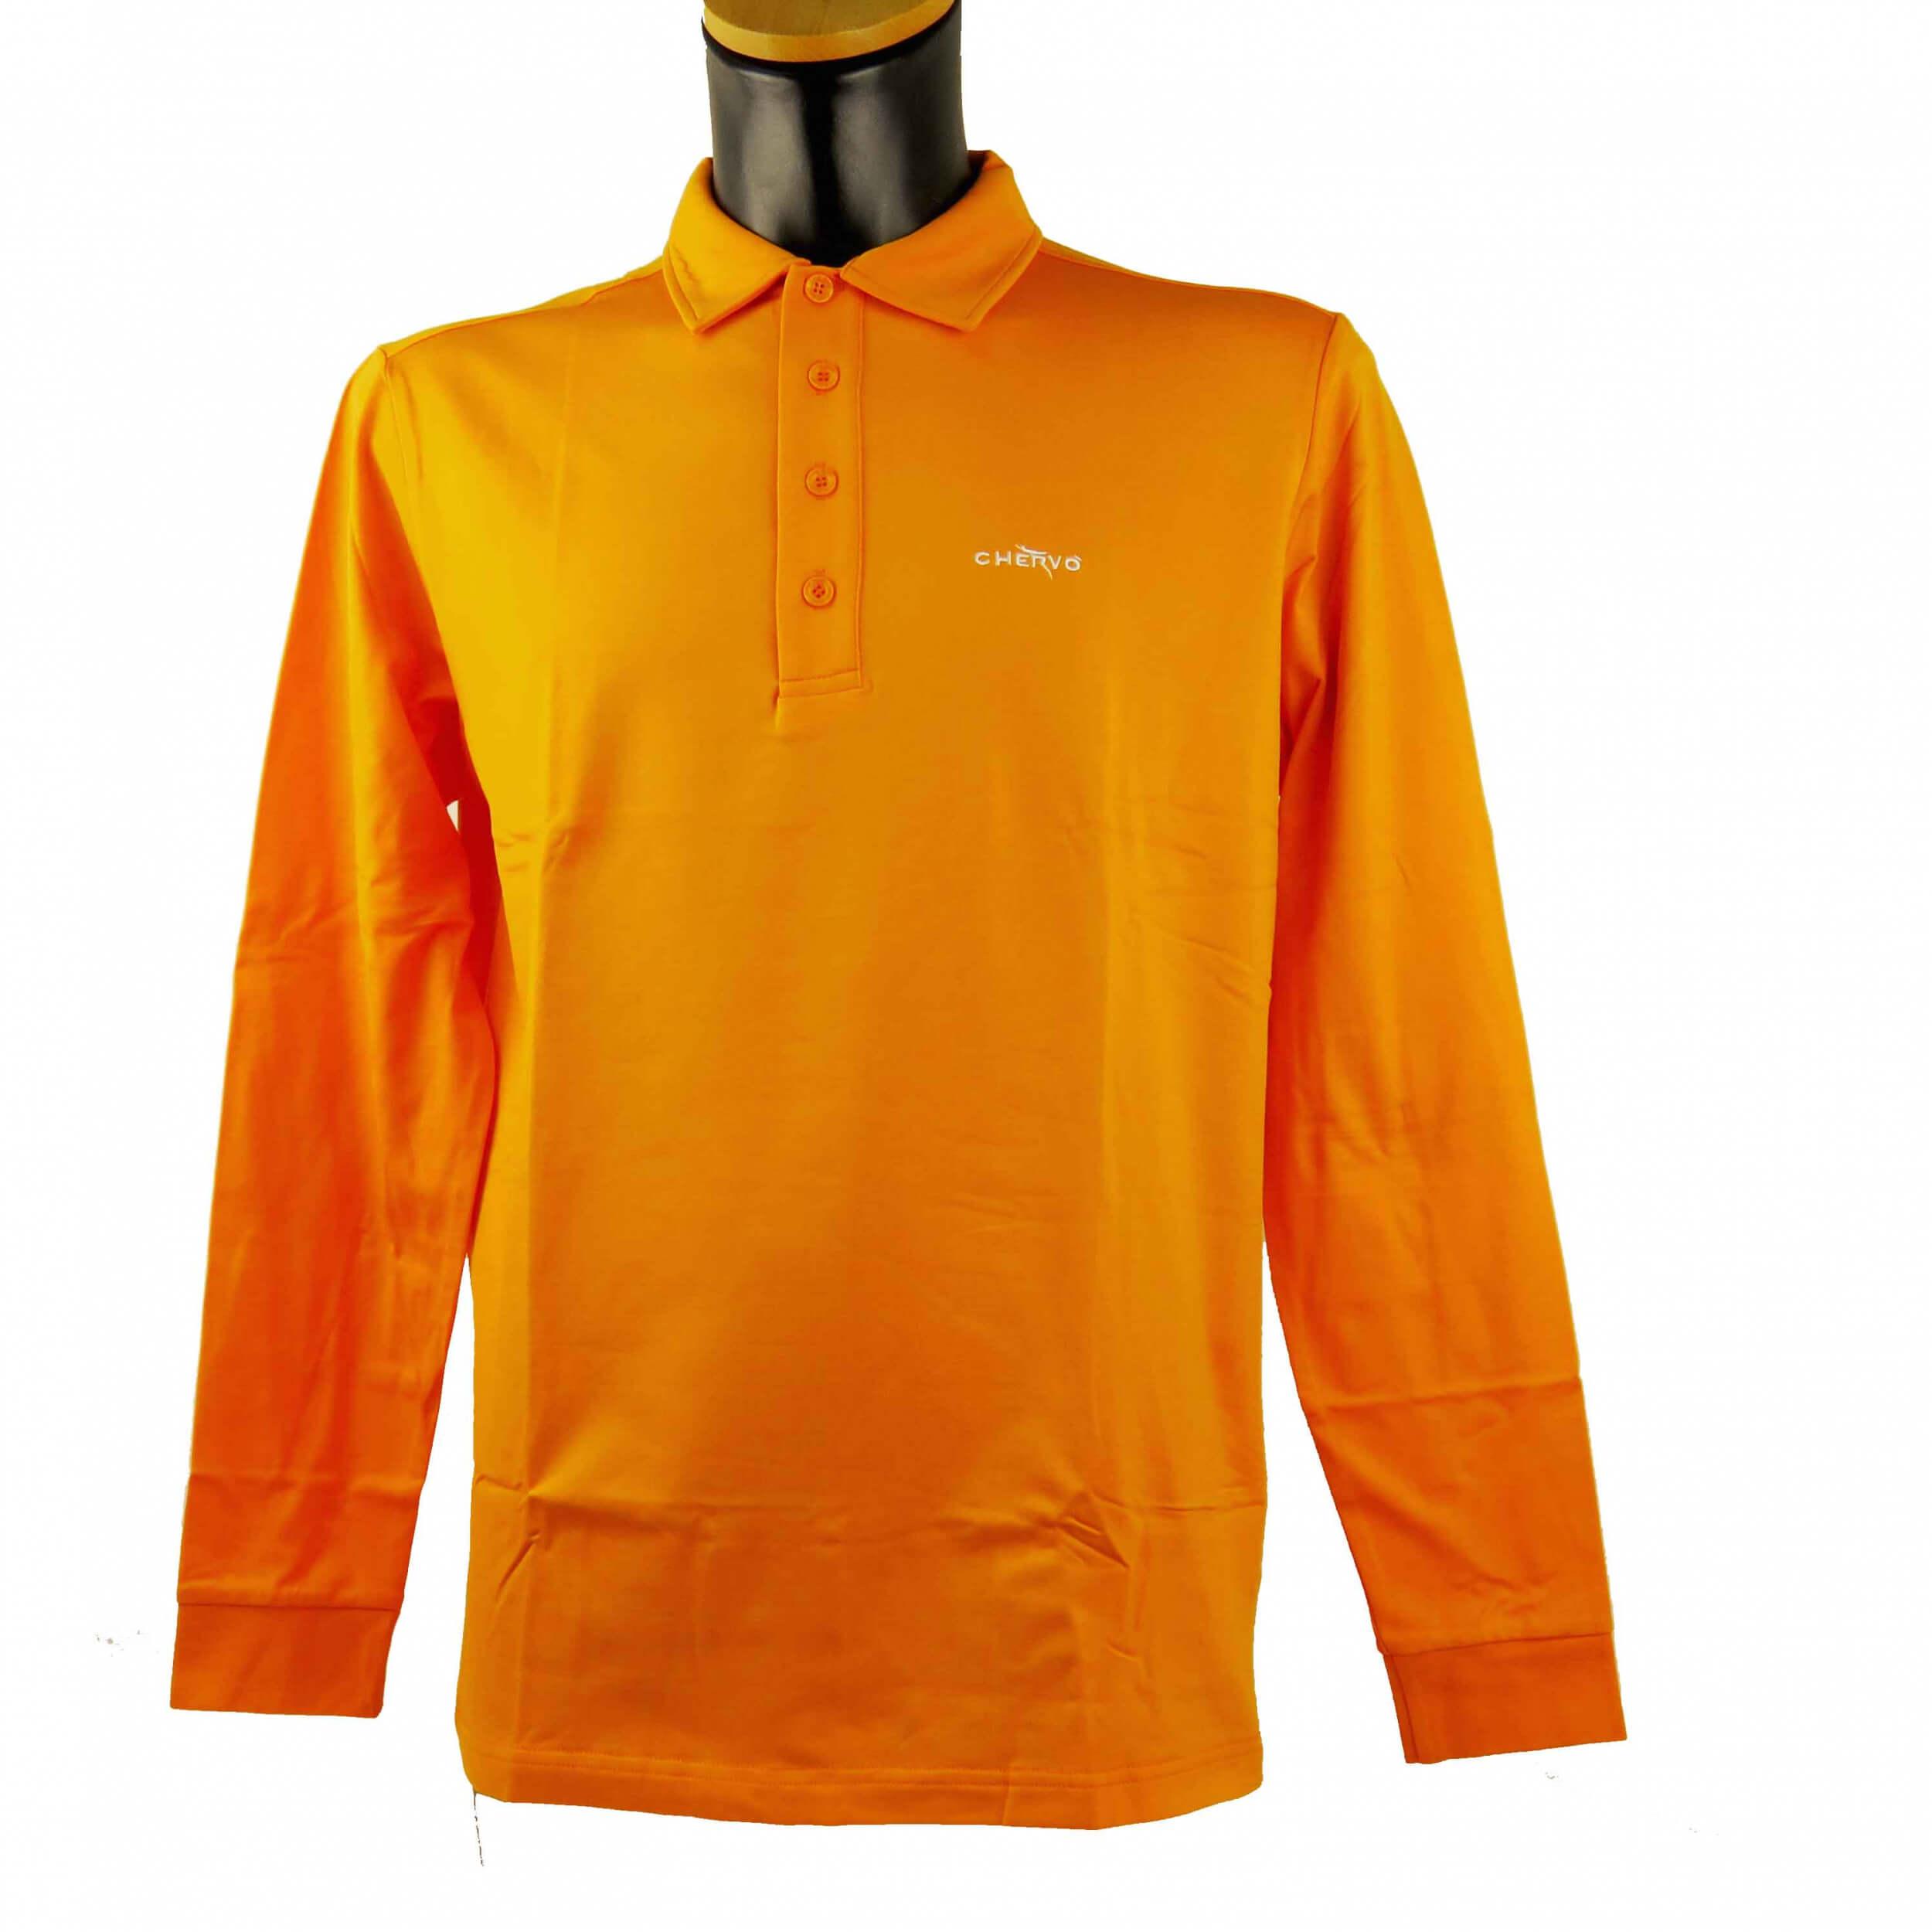 Chervo Herren Polo lang Arm Aurucon orange 2.Wahl